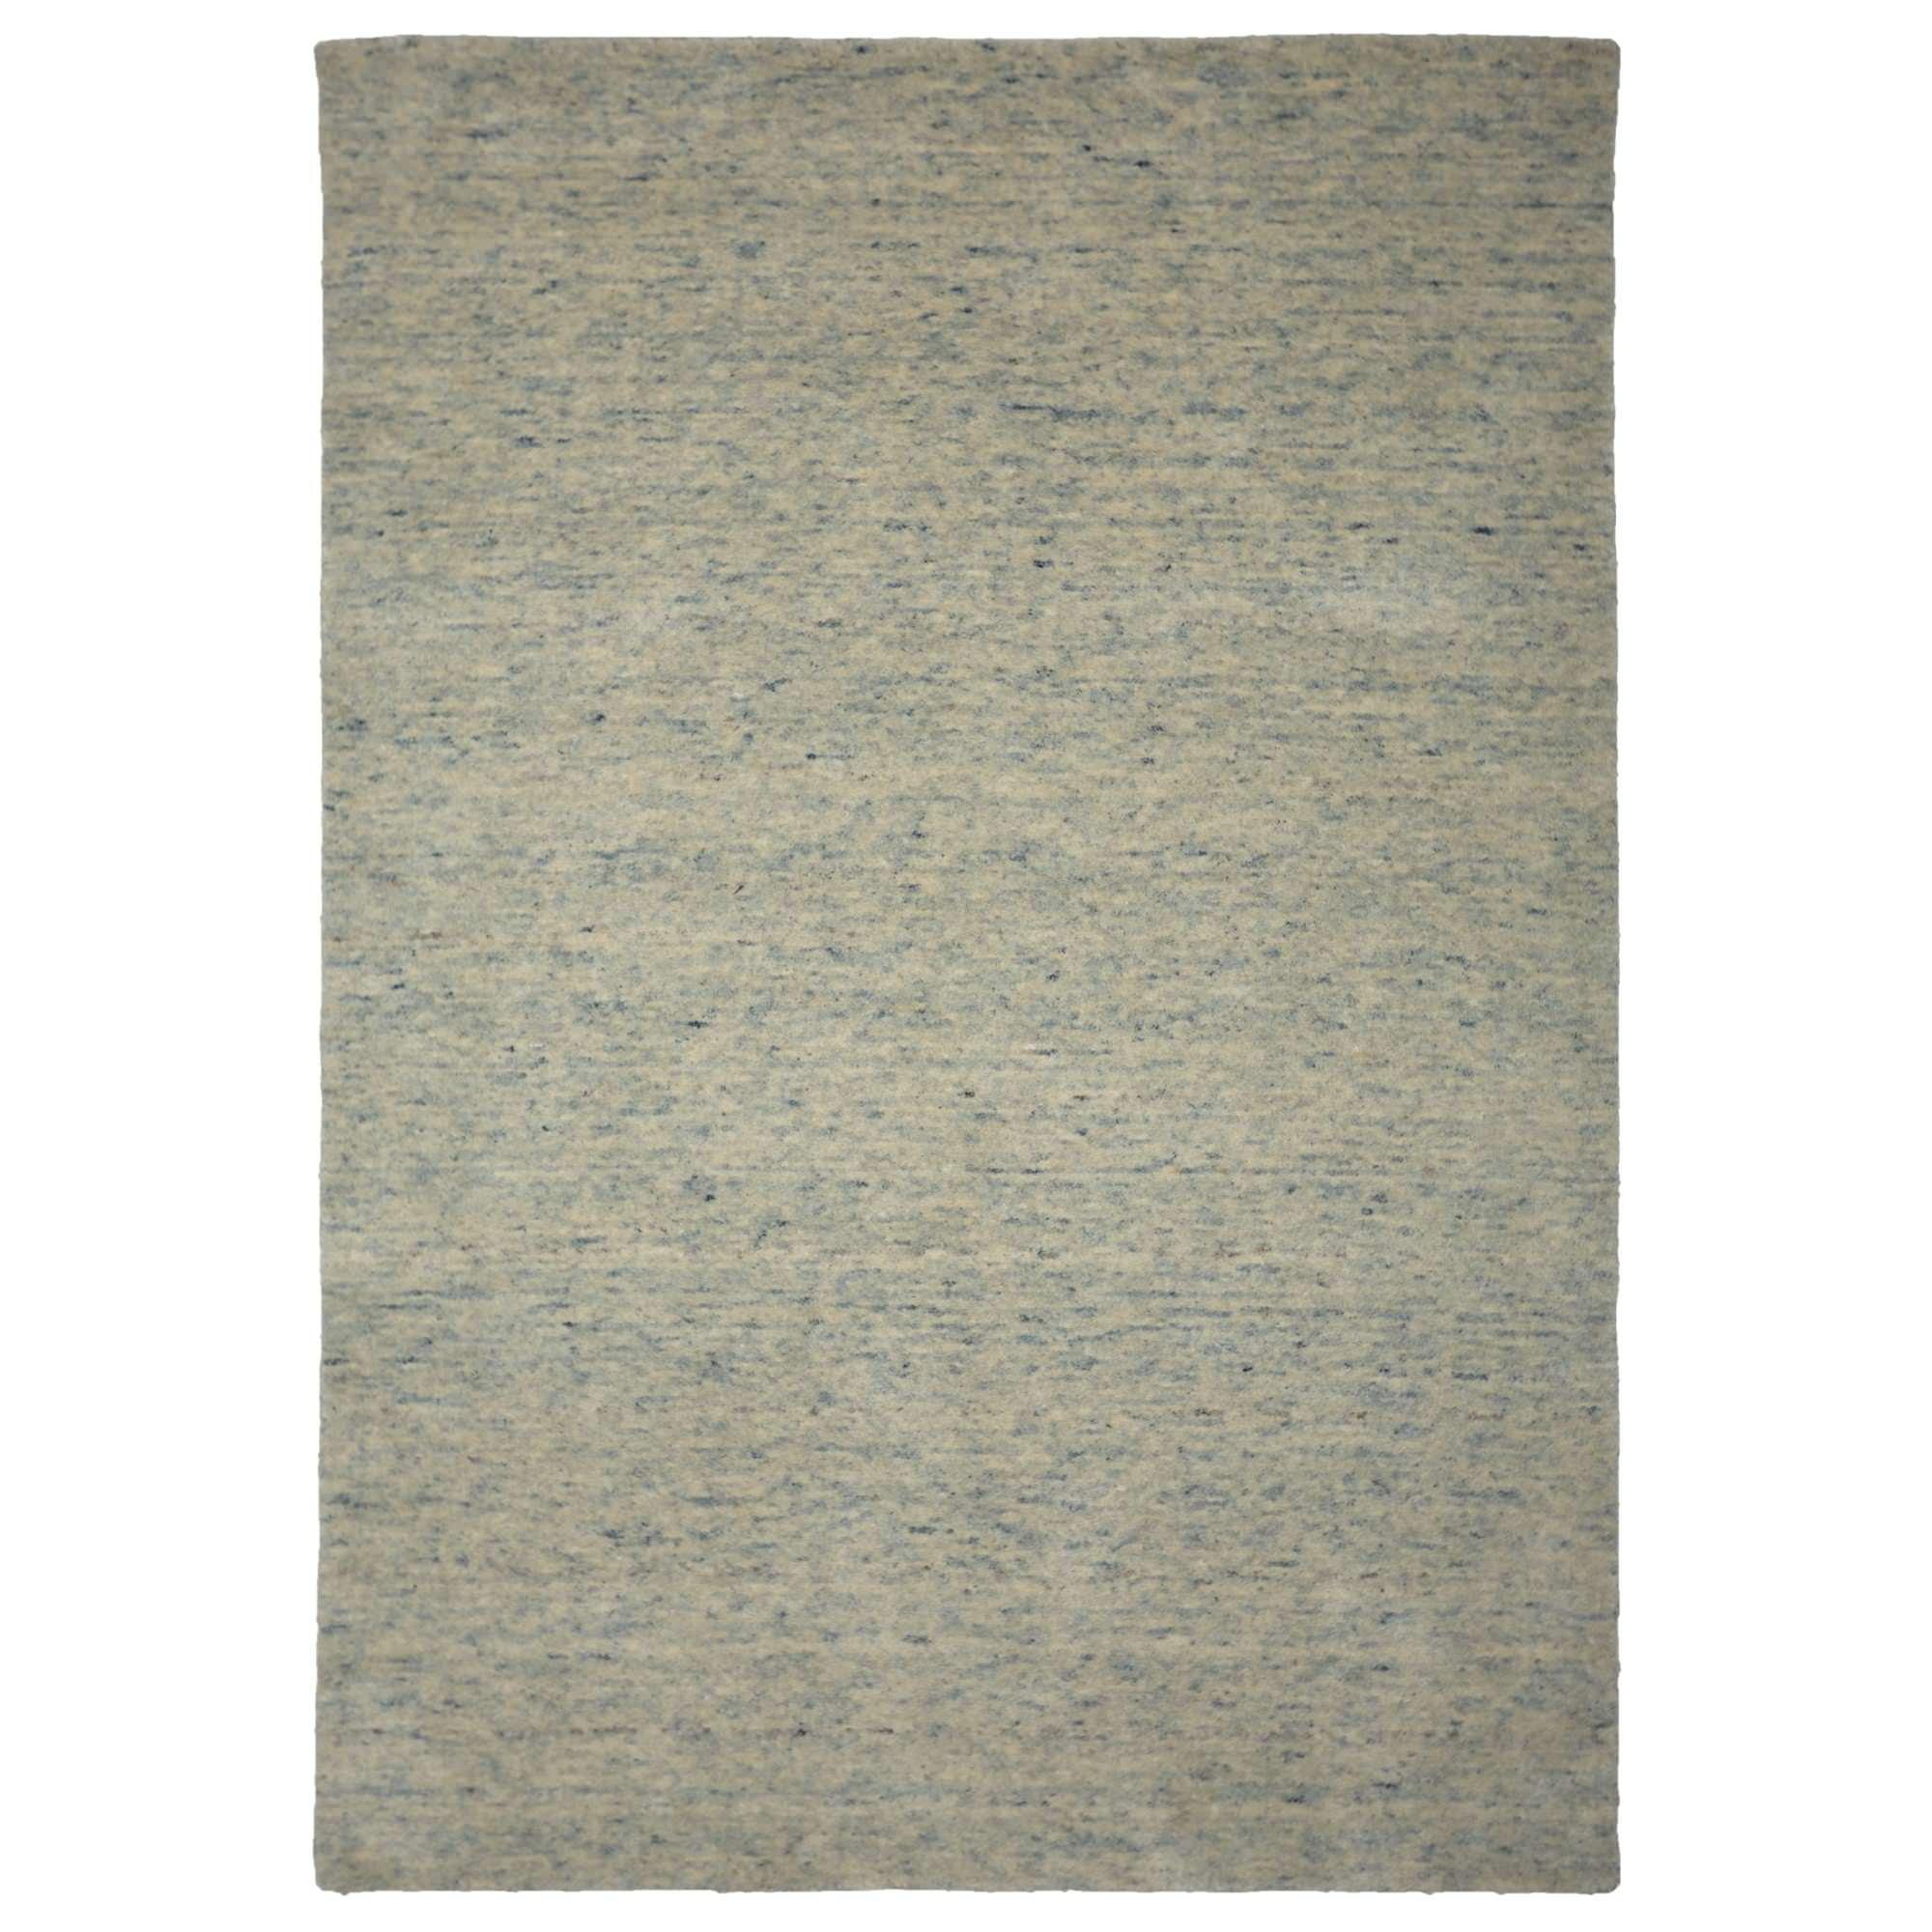 Ascot No.575 Handmade Wool Rug, 330x240cm, Sky Blue